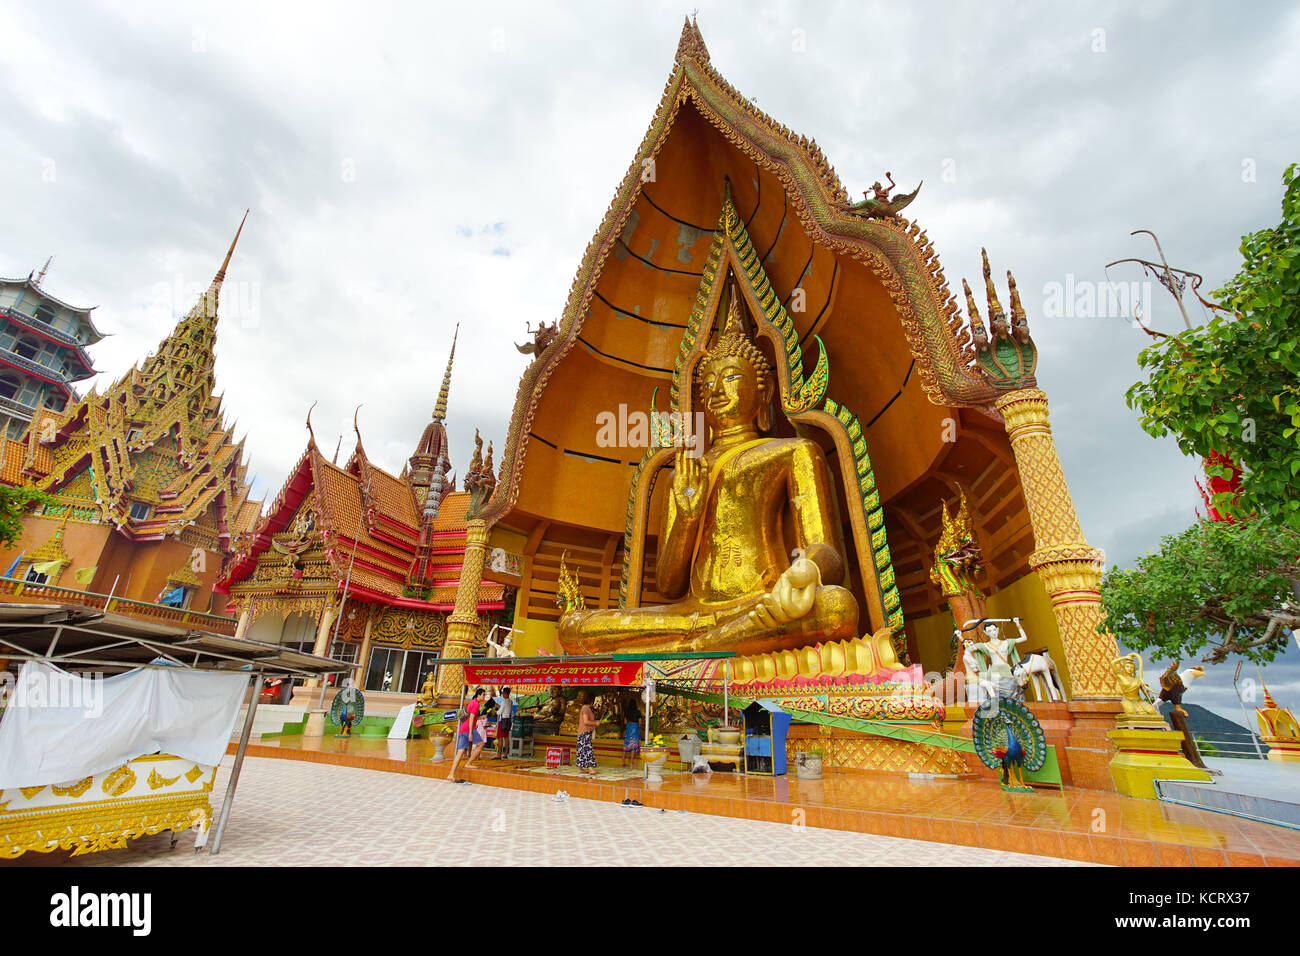 Kanchanaburi, Thailand - Juli 7, 2017: Wat Tham Sua ist die schönsten Tempel in Kanchanaburi, Thailand. 7. Juli Stockfoto